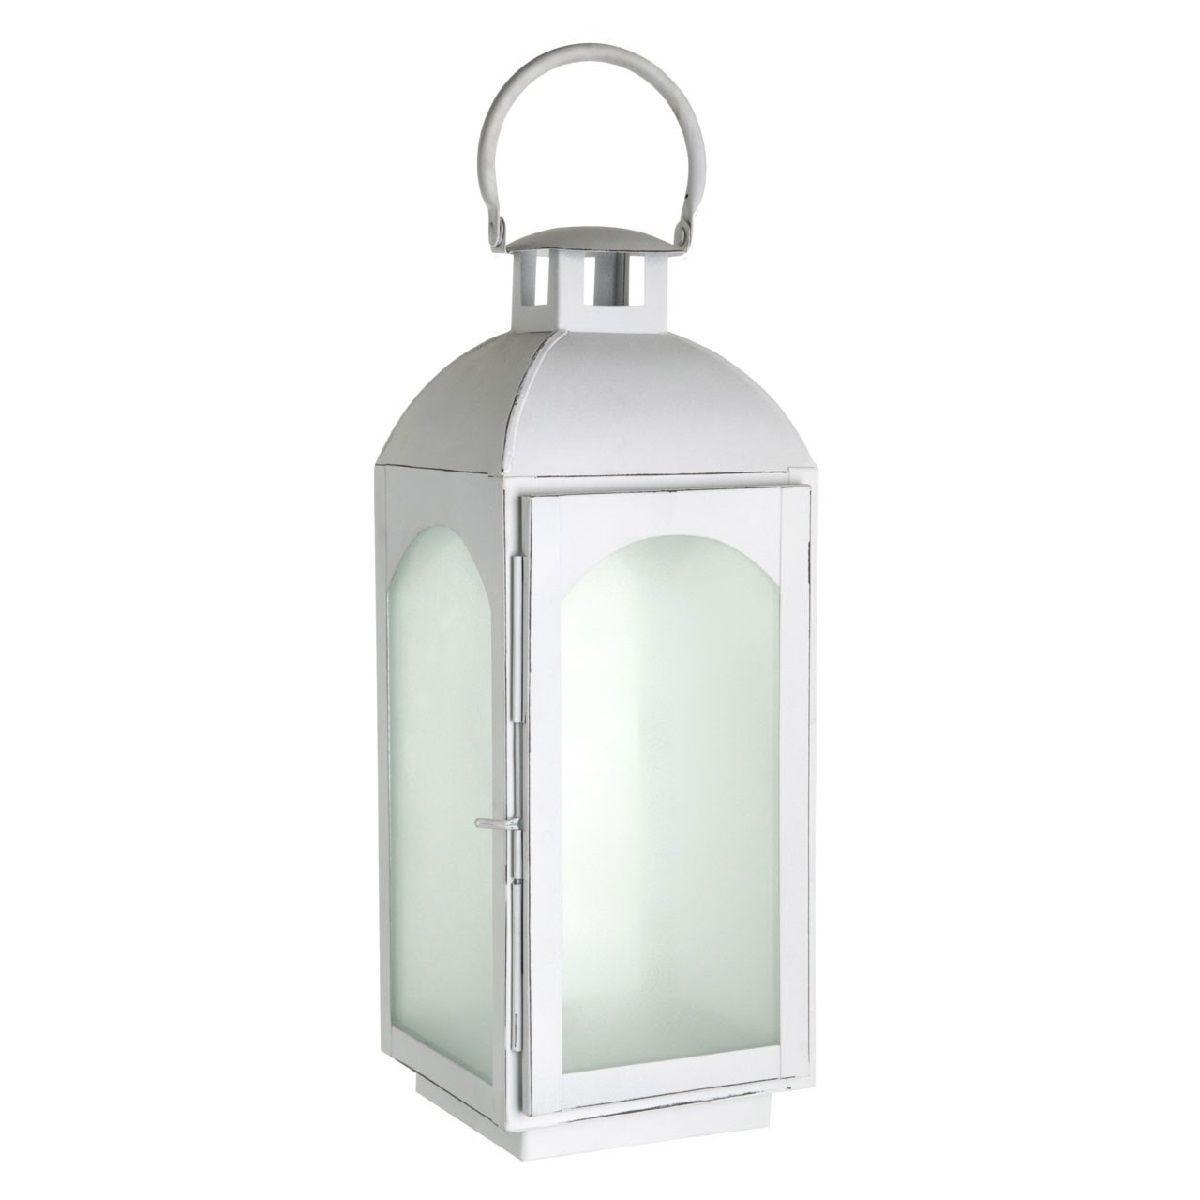 Premier Housewares Complements Small Lantern - White Wash